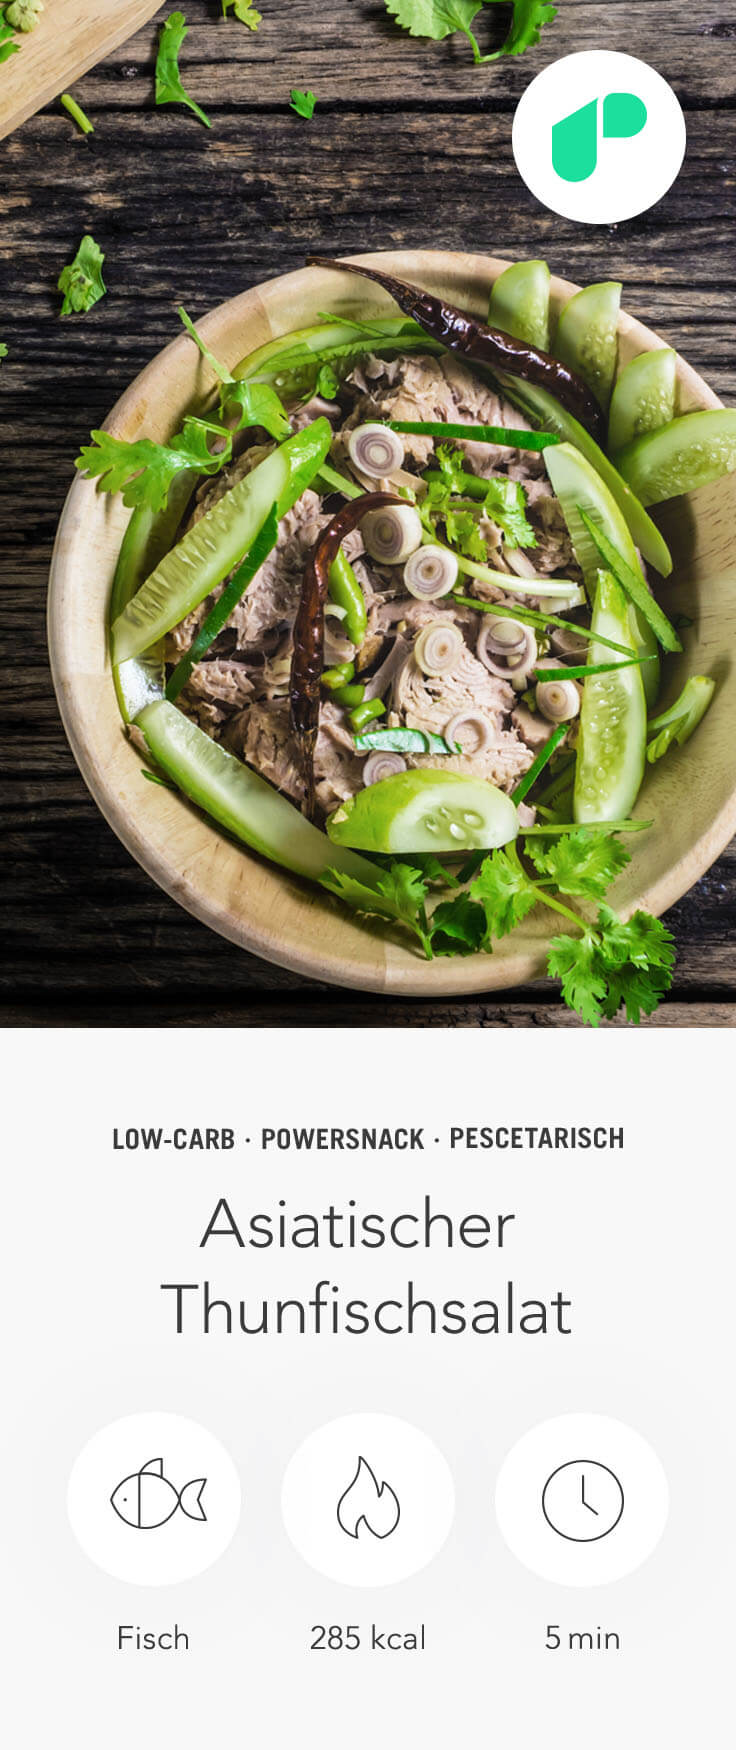 Upfit - Asiatischer Thunfischsalat Pin